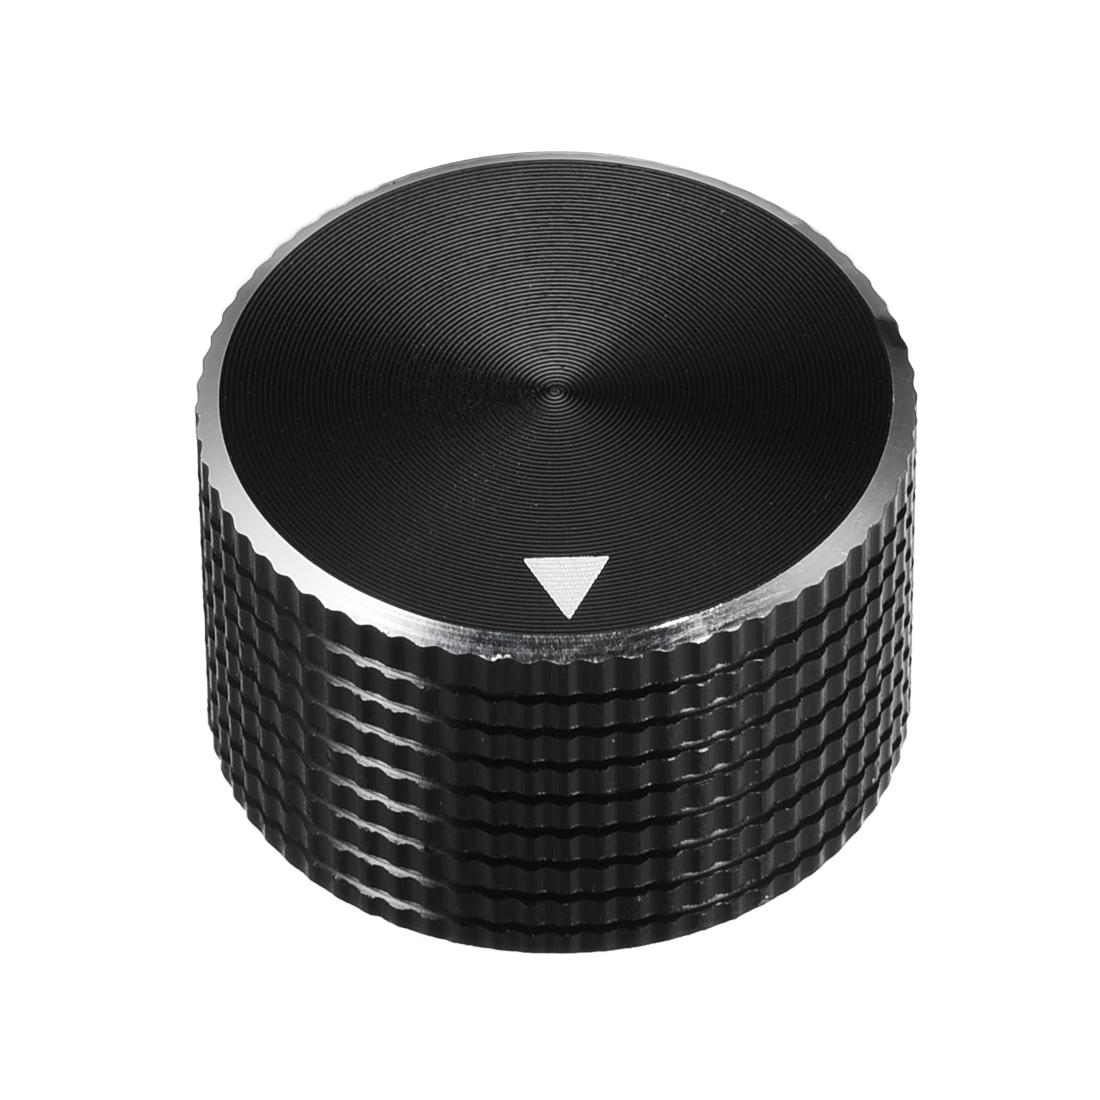 Stereo Knob, 25*6*15.5 mm Aluminium Alloy, Volume Control Knobs, Black